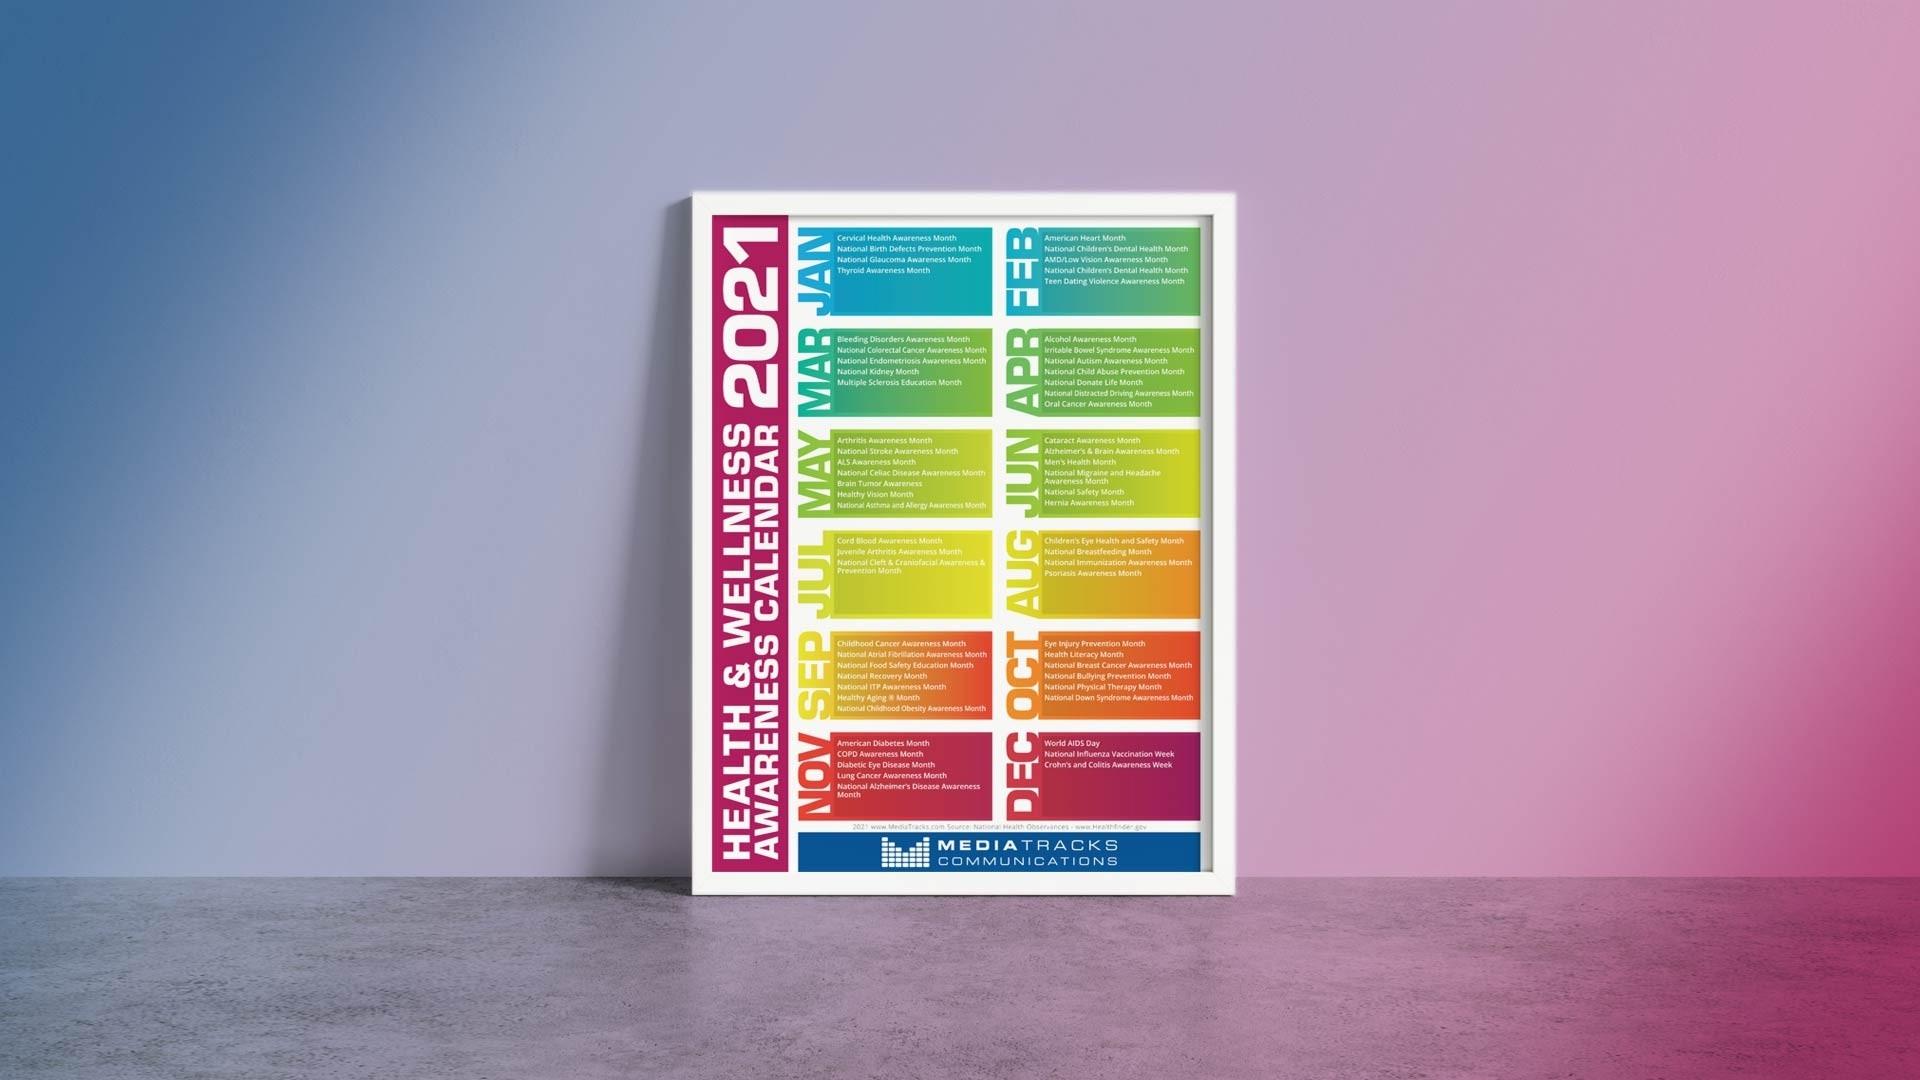 2021 Health & Awareness Calendar Mediatracks | 5Th Annual-Printable Healthcare Awareness Calendar 2021